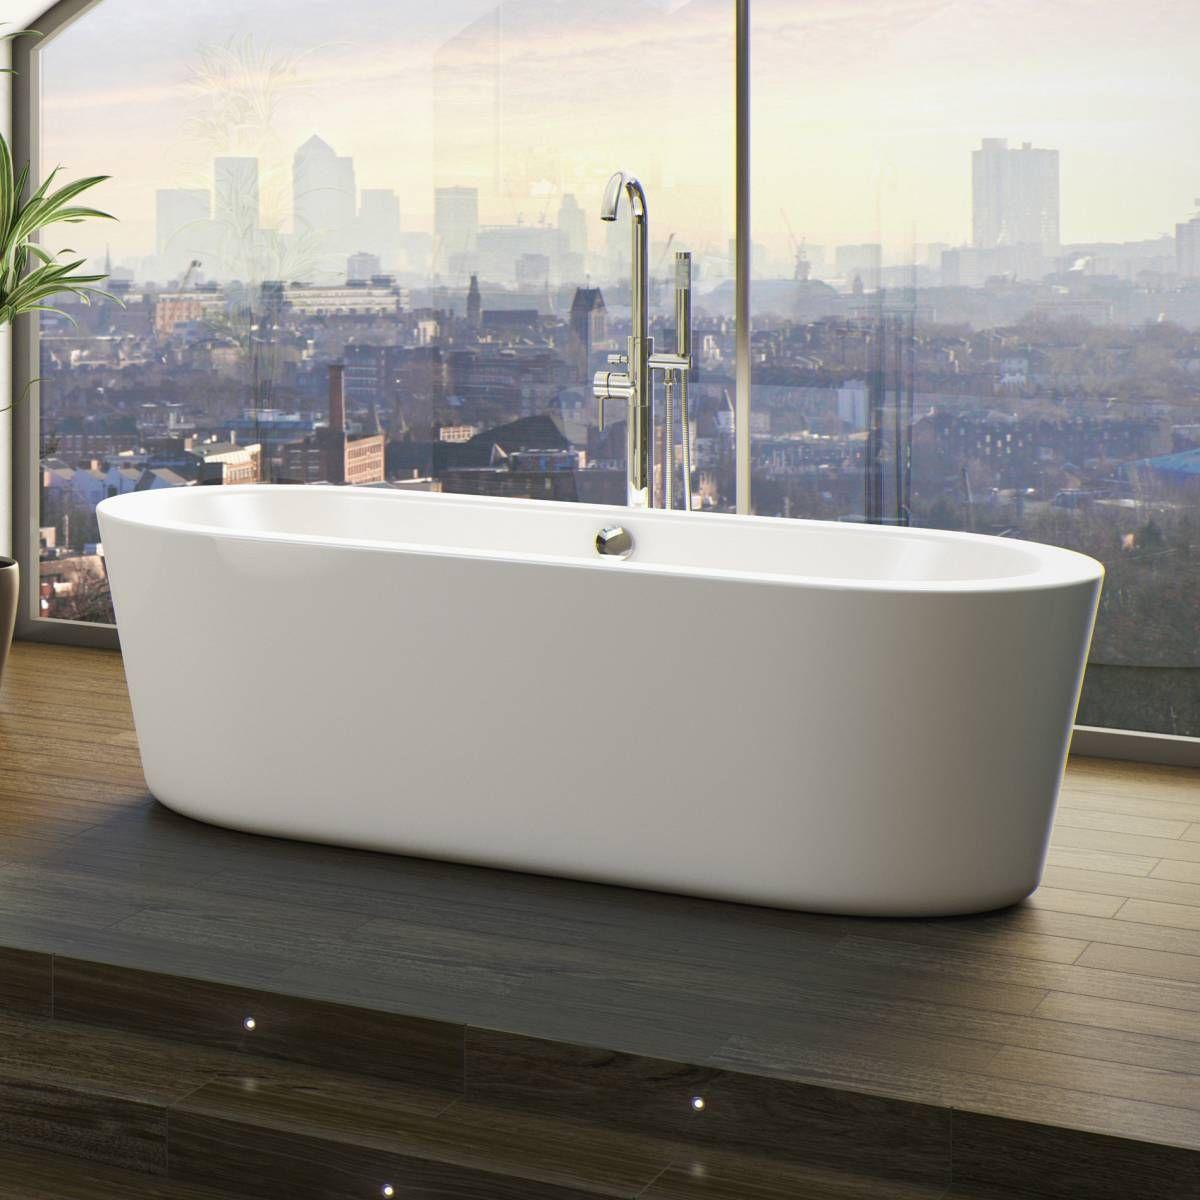 Plumbs bathroom suites - Arc Freestanding Bath Large Now 299 99 Less Than Half Price